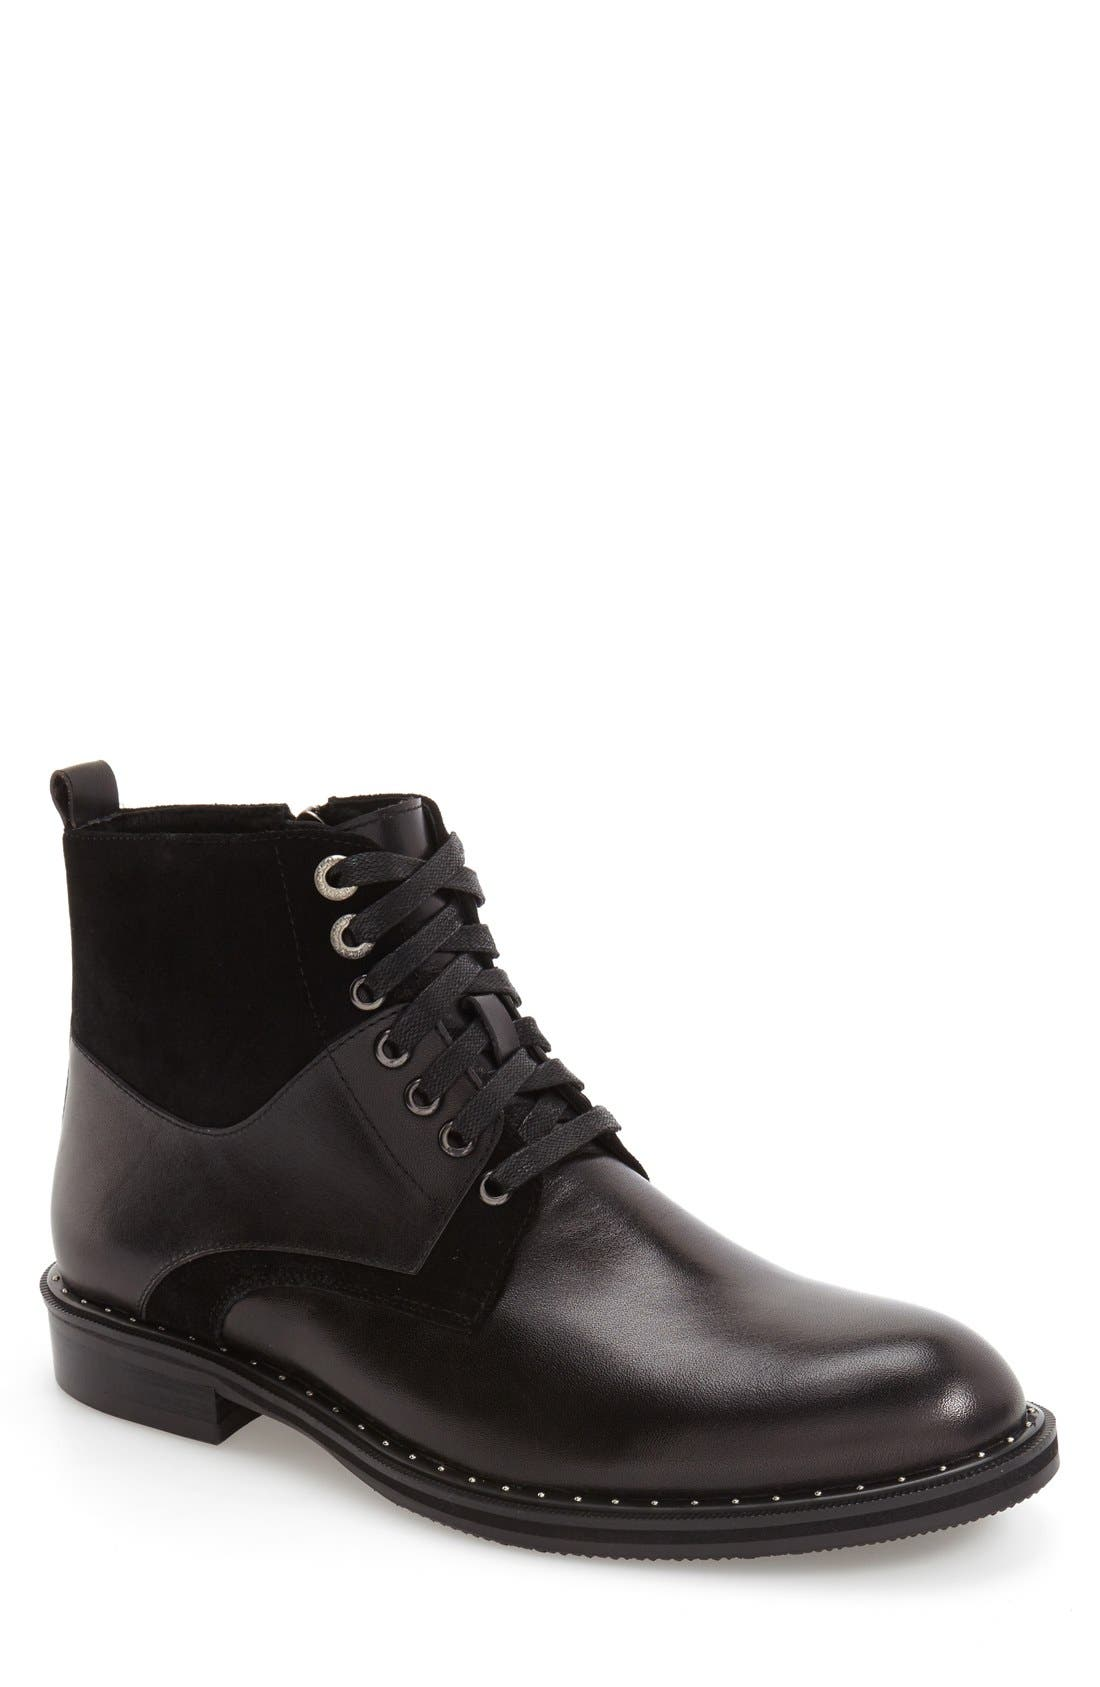 'Verona' Midi Studded Boot,                             Main thumbnail 1, color,                             001